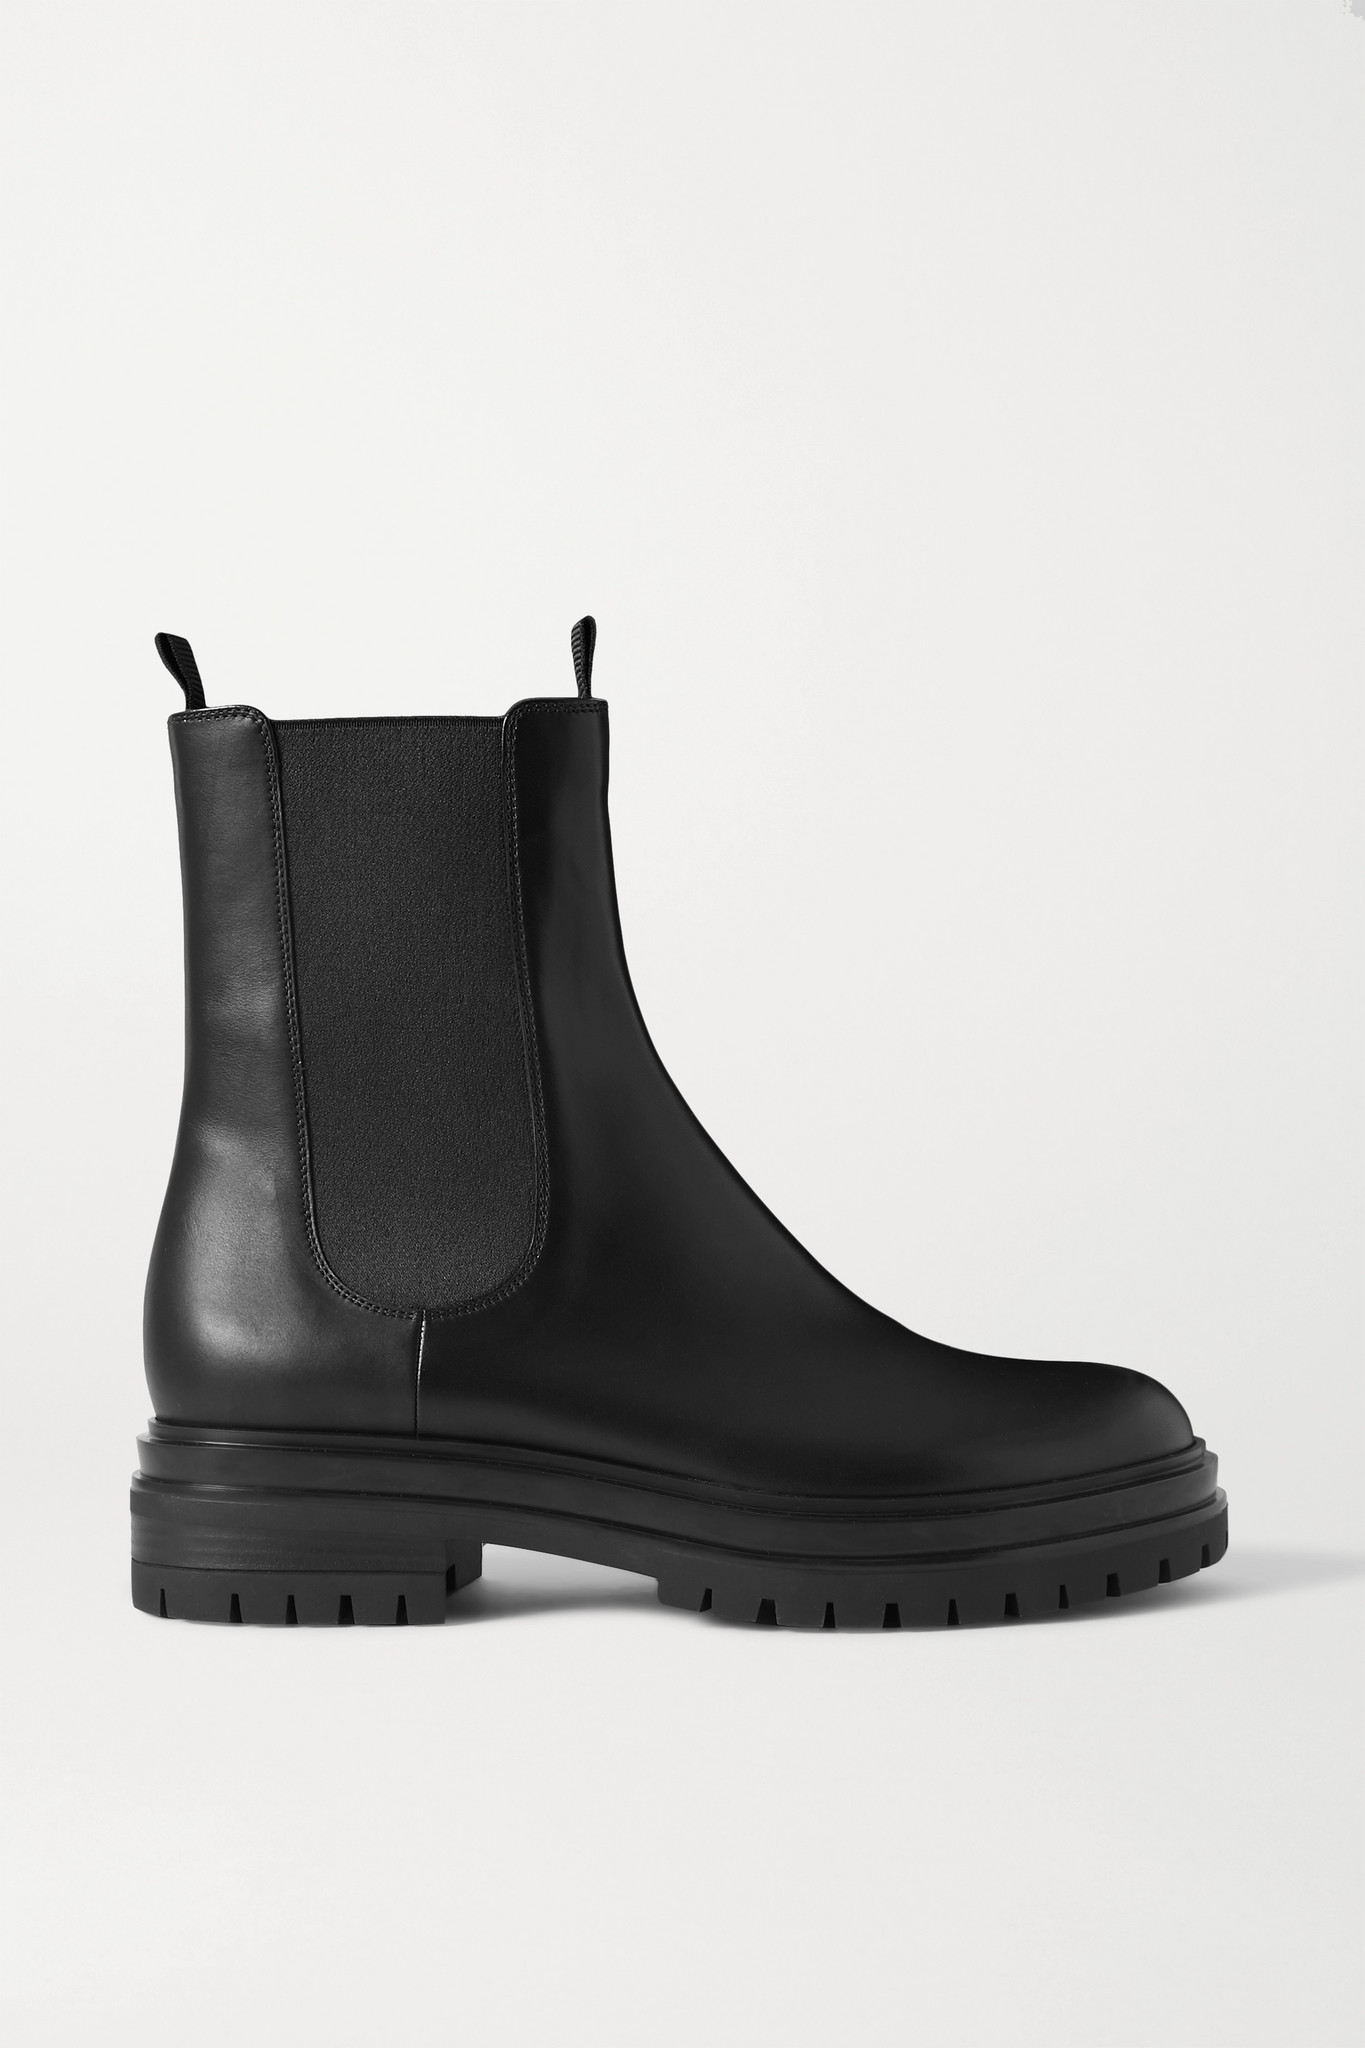 GIANVITO ROSSI - 皮革切尔西靴 - 黑色 - IT35